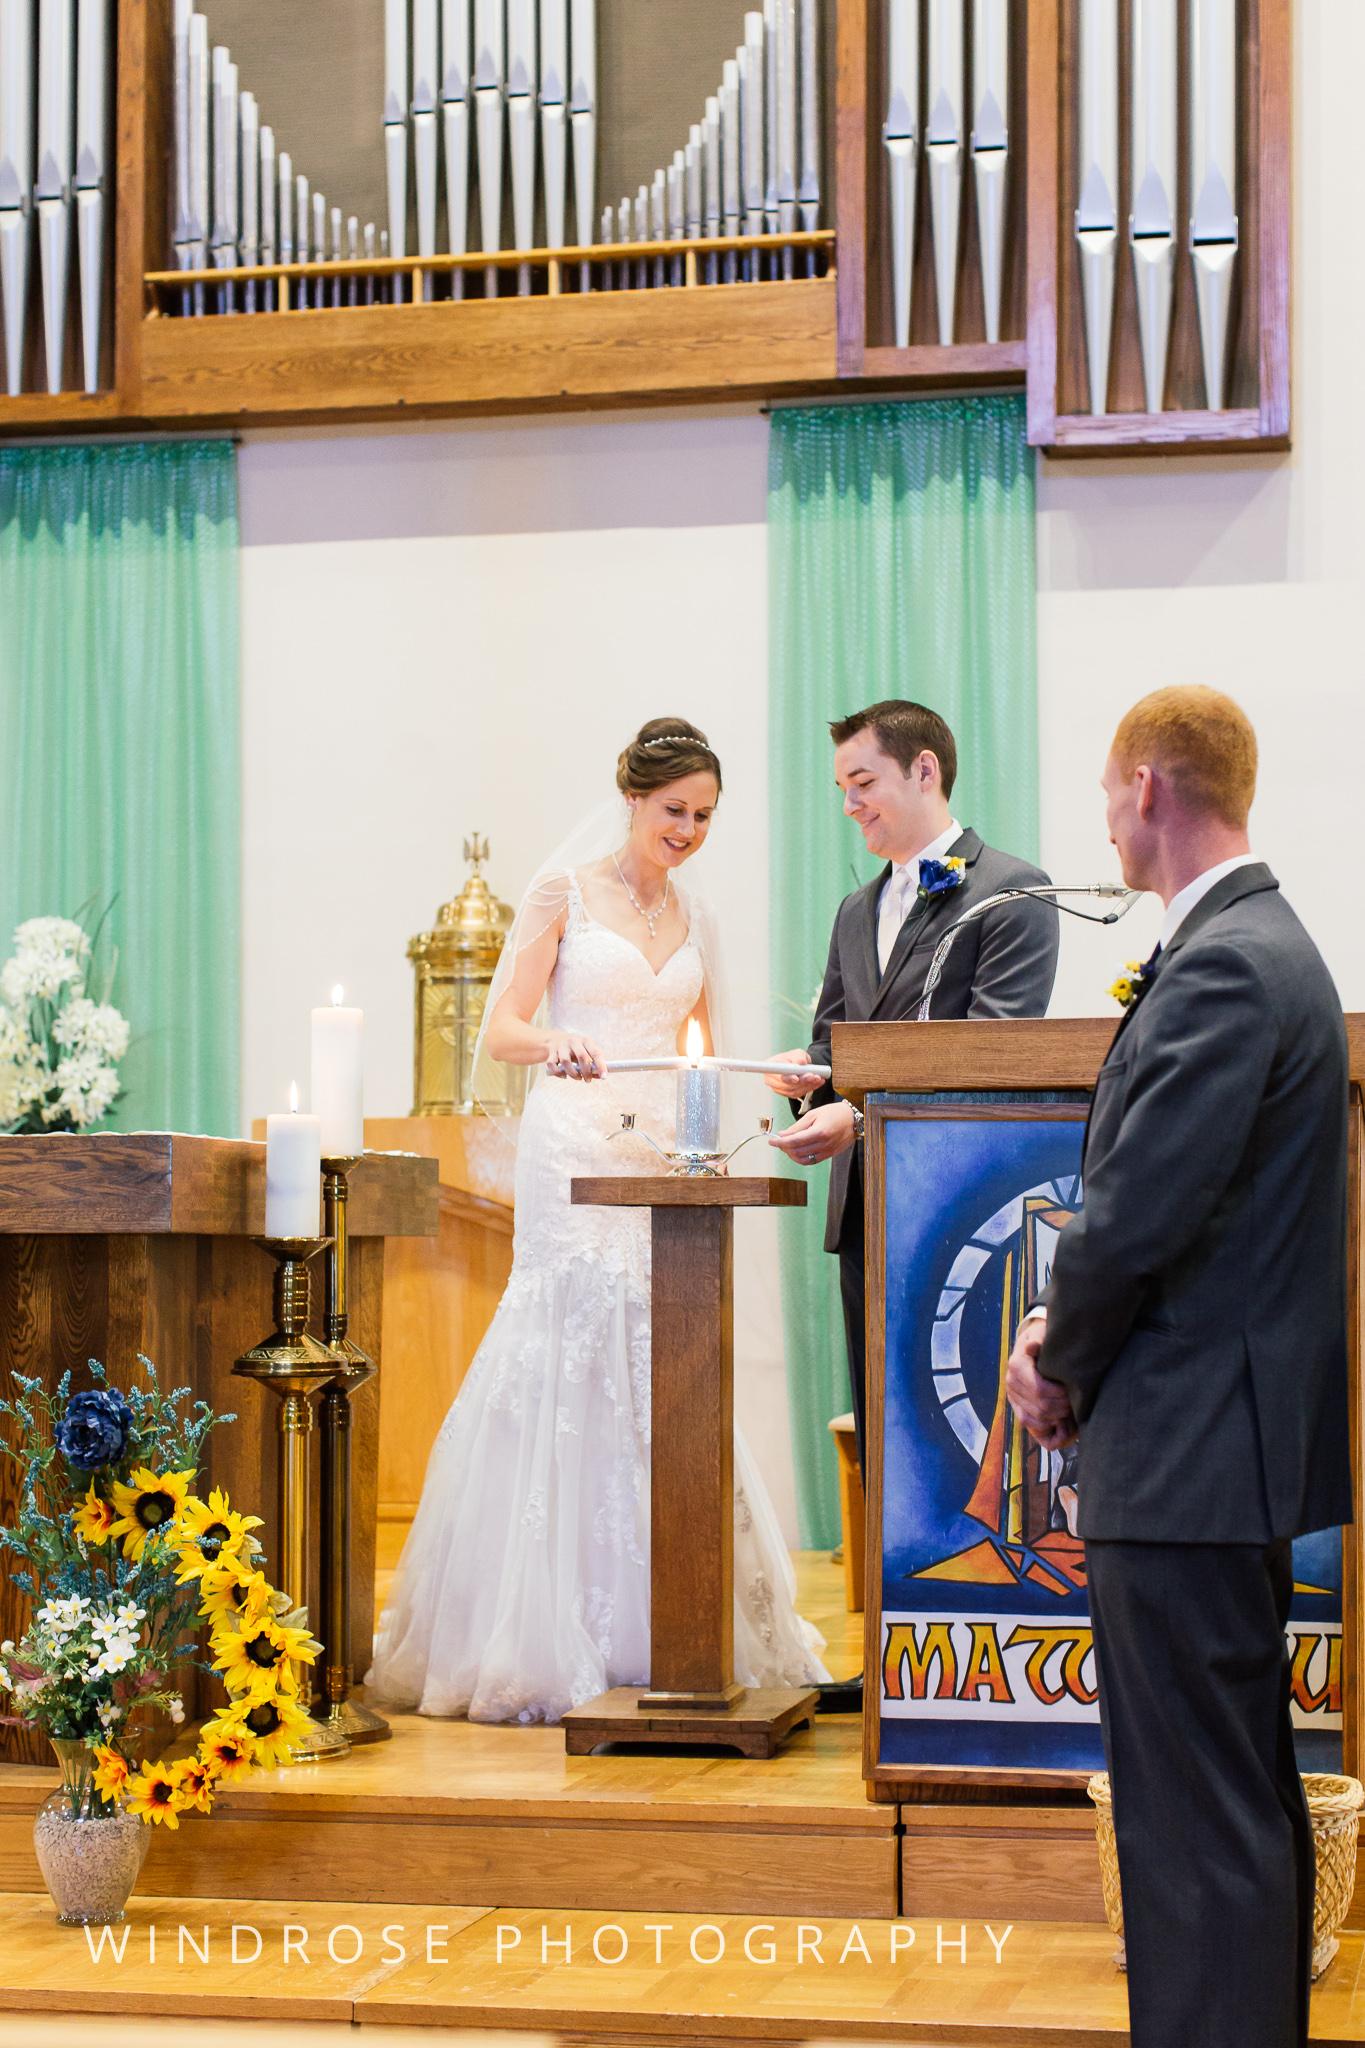 La-Crosse-Country-Club-Wedding-Minnesota-Wedding-Photographer-22.jpg